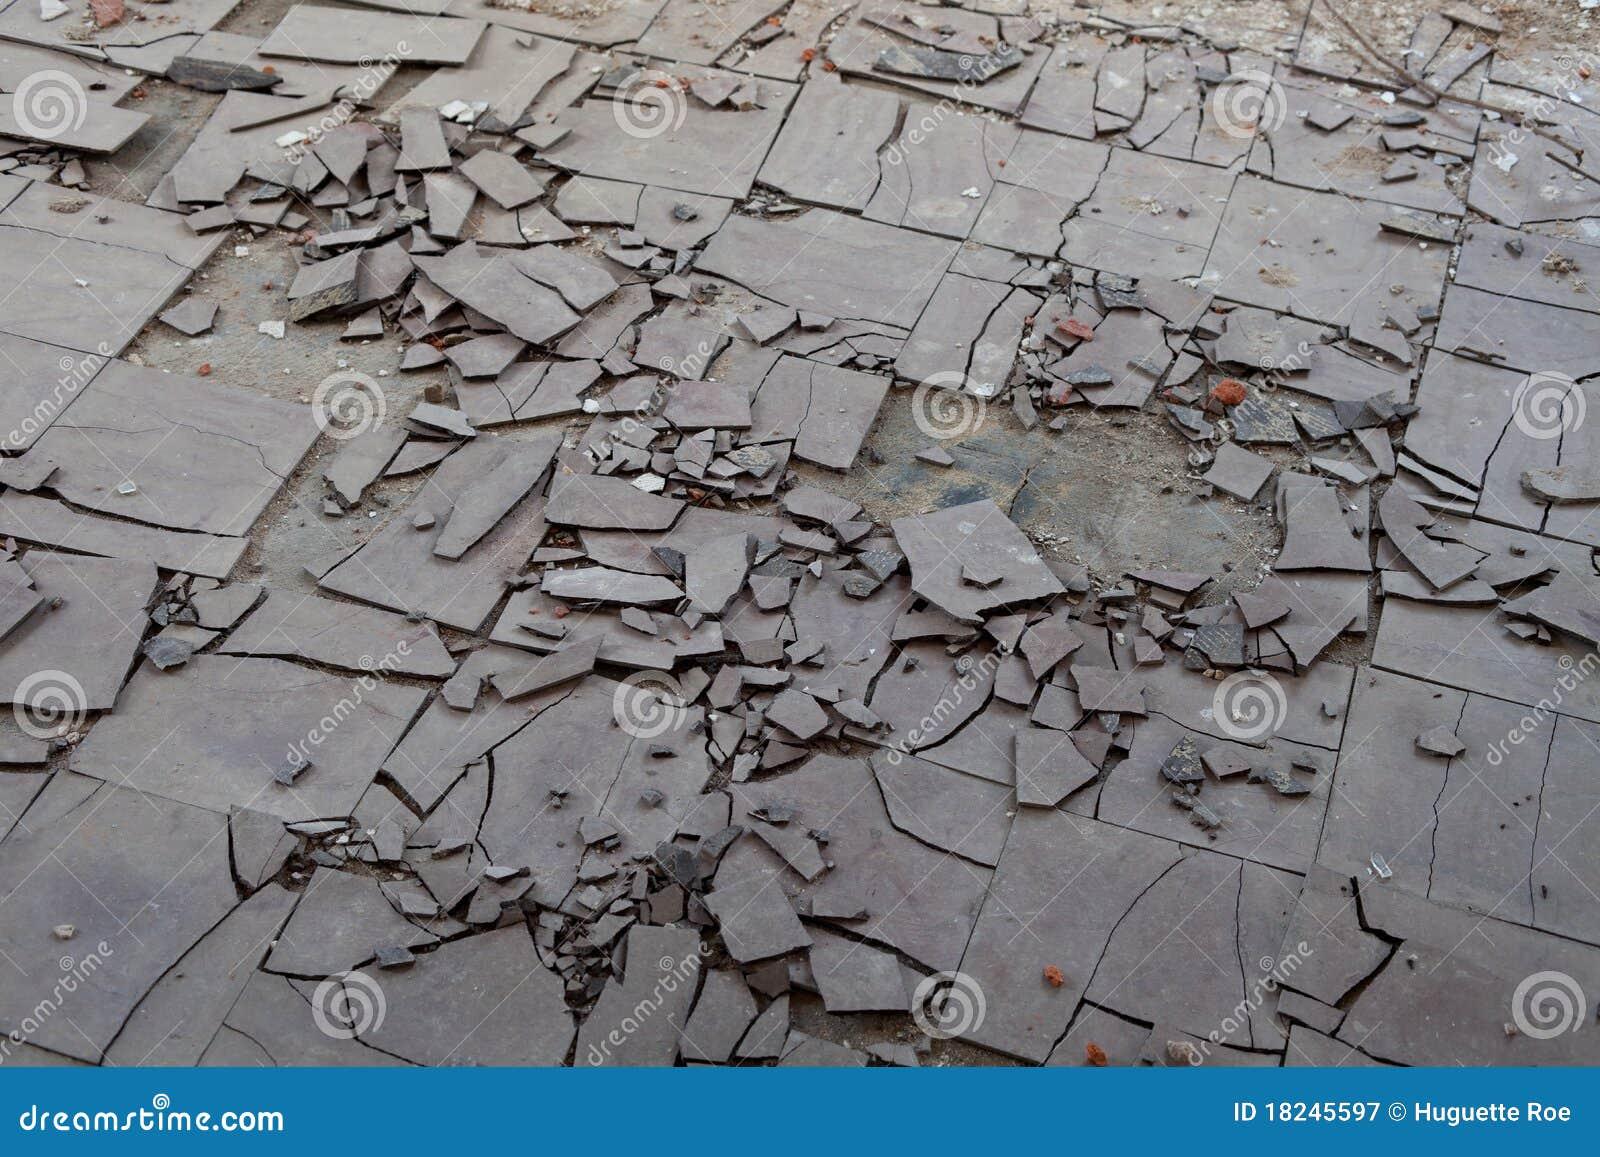 Asbestos floor tiles stock image image of asbestosis 18245597 asbestos floor tiles dailygadgetfo Images